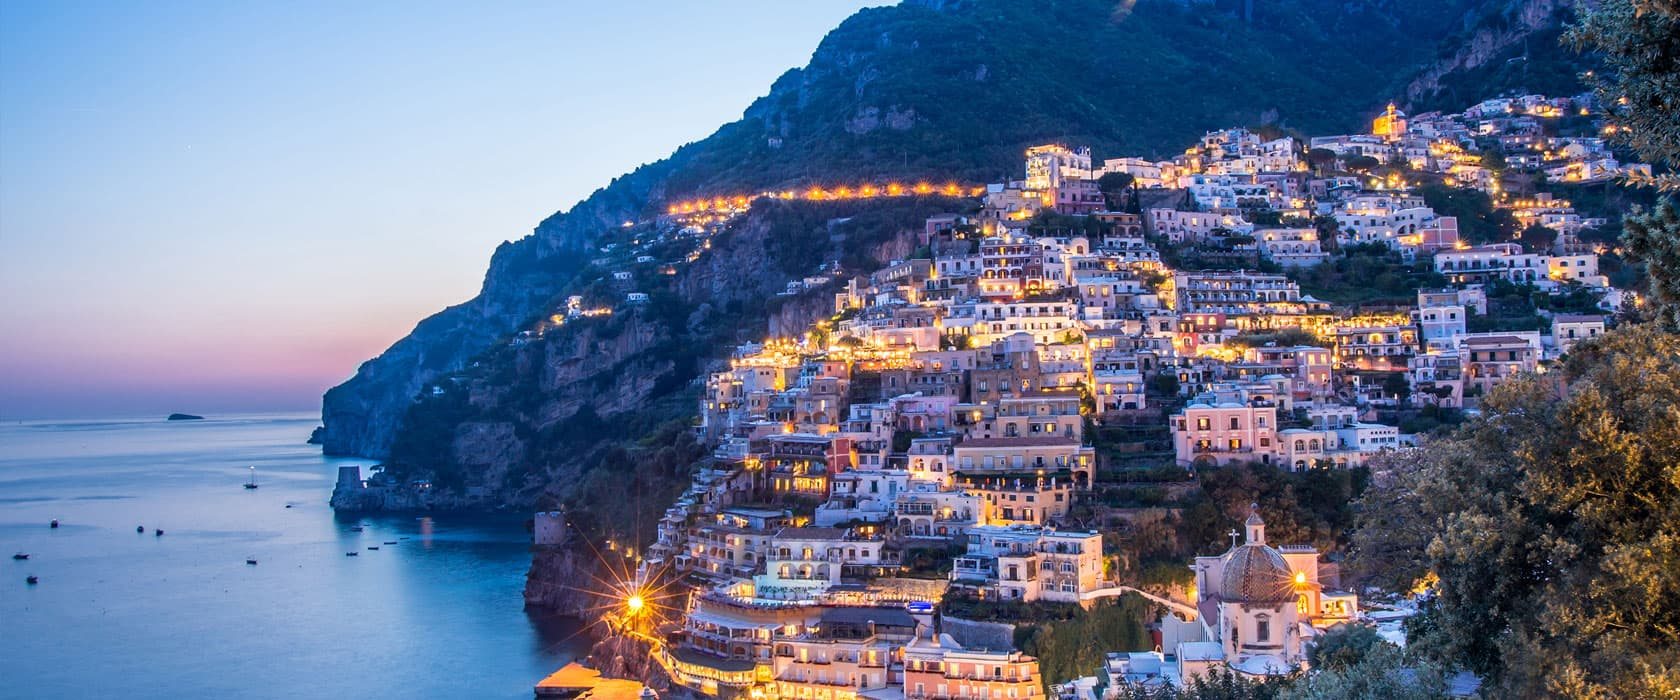 positano-amalfi-coast-1680x700